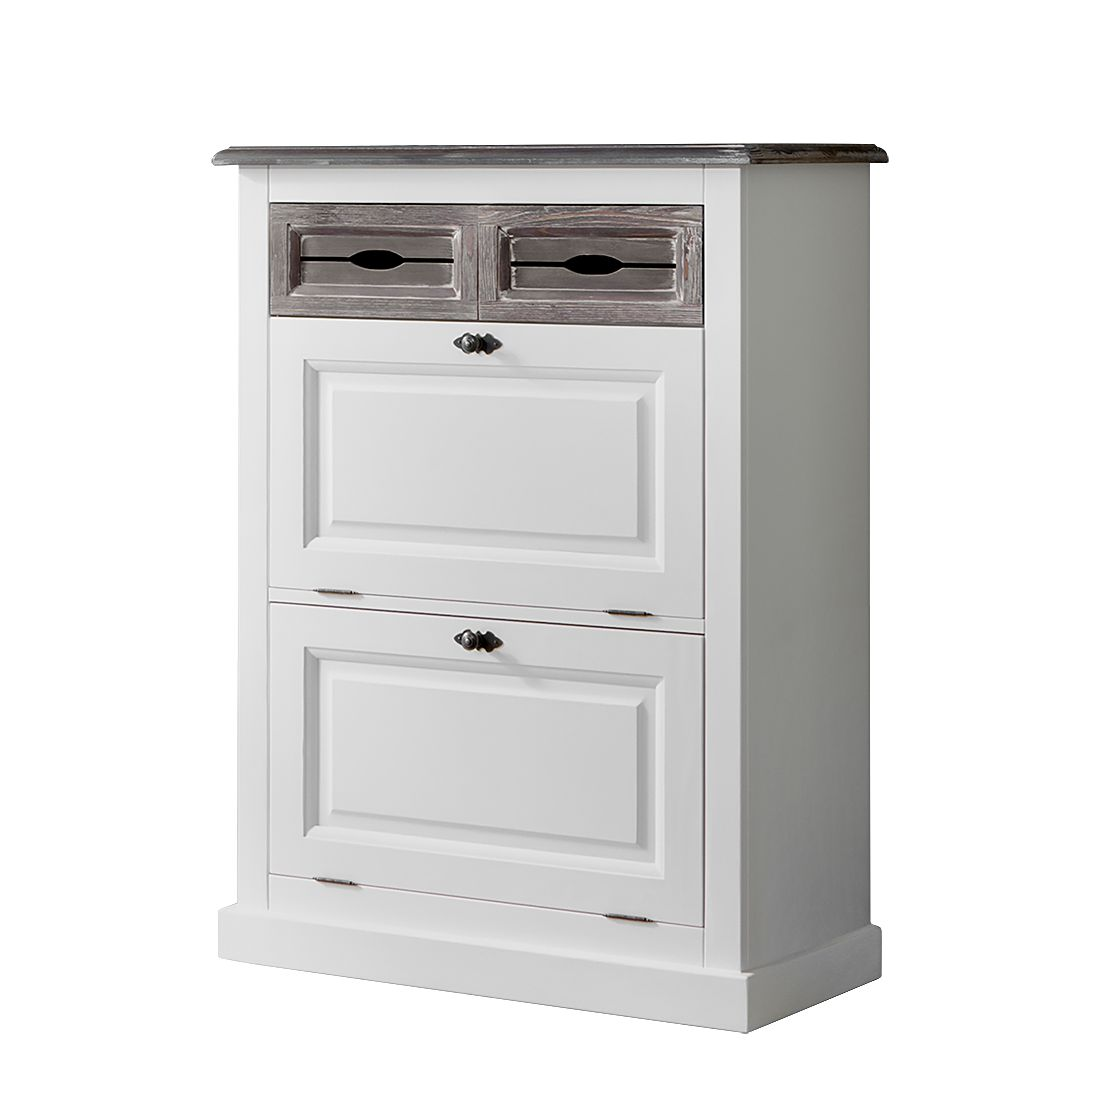 880c1ade2783a2 Details zu Schuhschrank Cabinet – Lila – 5 Klappen – Höhe 174 cm